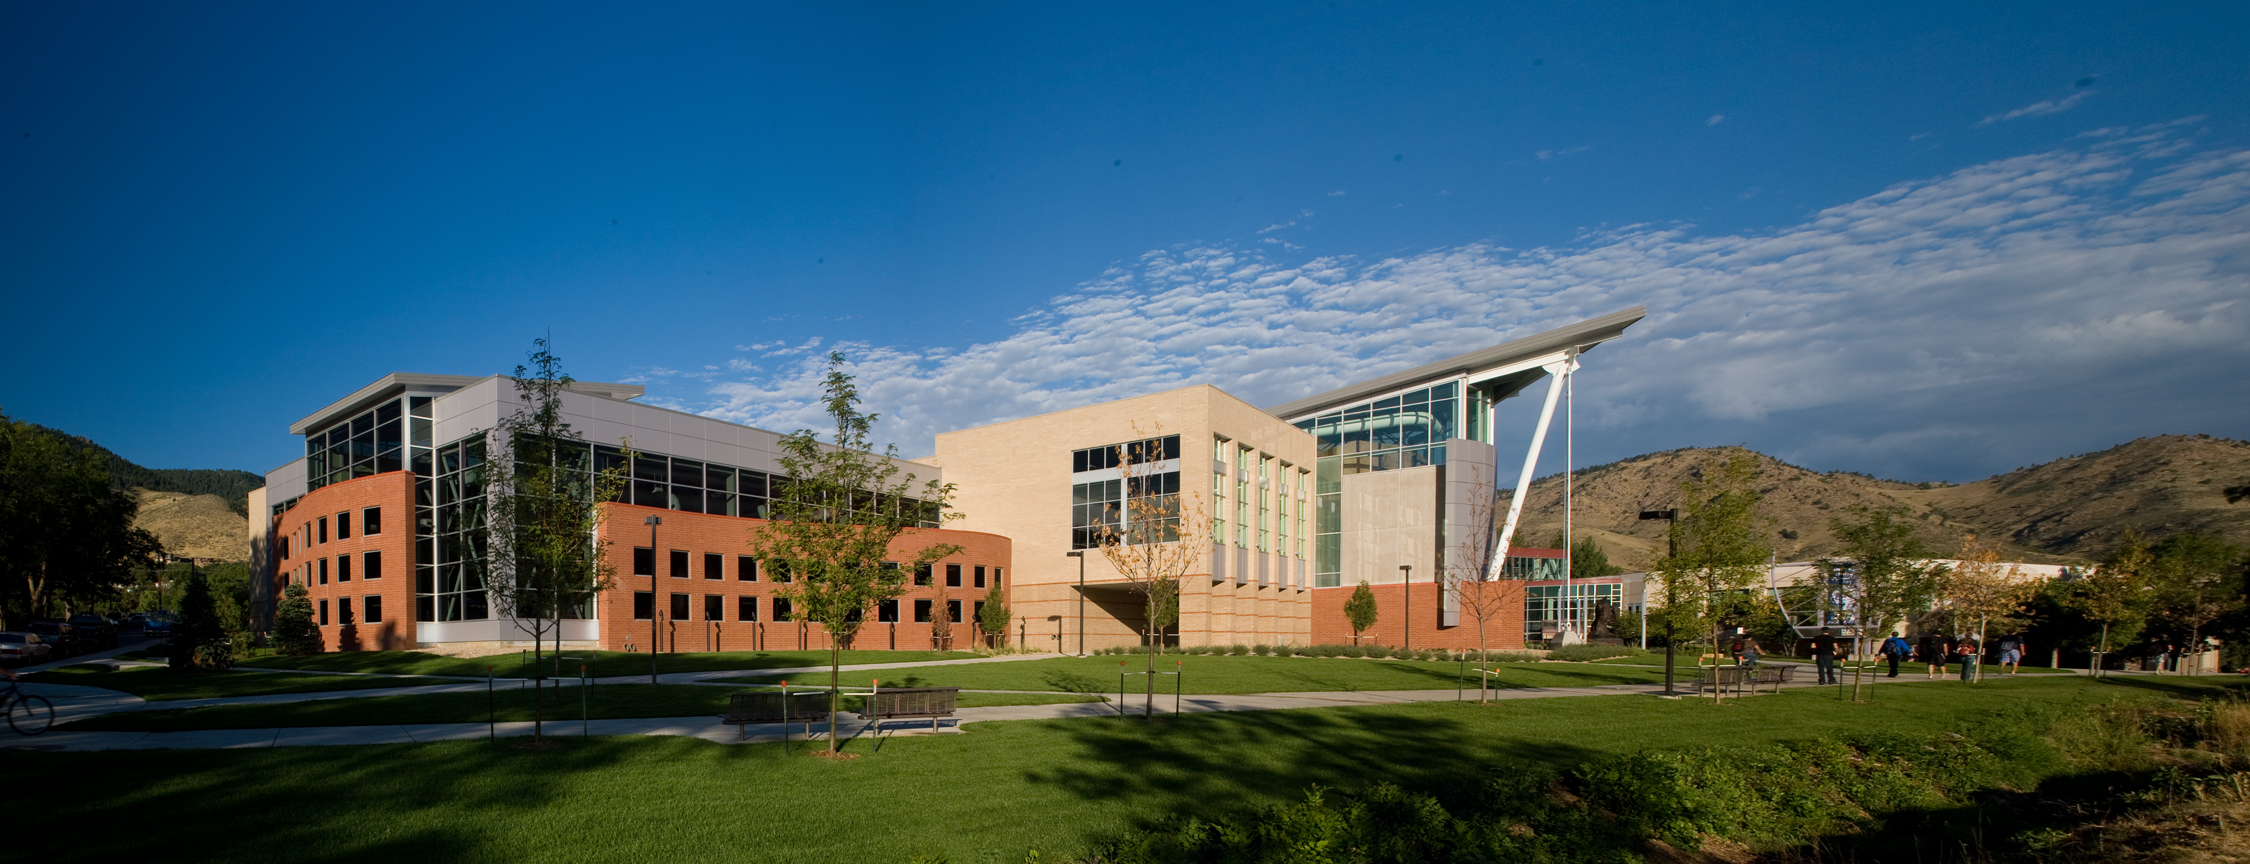 "<img src="" studioINSITE_School_of_Mines_Campus_Recreation_Ctr.jpg ""alt=""Science Building, College Stadium, Pedestrian Mall, Sculpture Garden, Sustainable Campus, Bioswale, Landscape Architecture, Colorado School of Mines, Recreation Center  "" title=""Colorado School of Mines""/>"